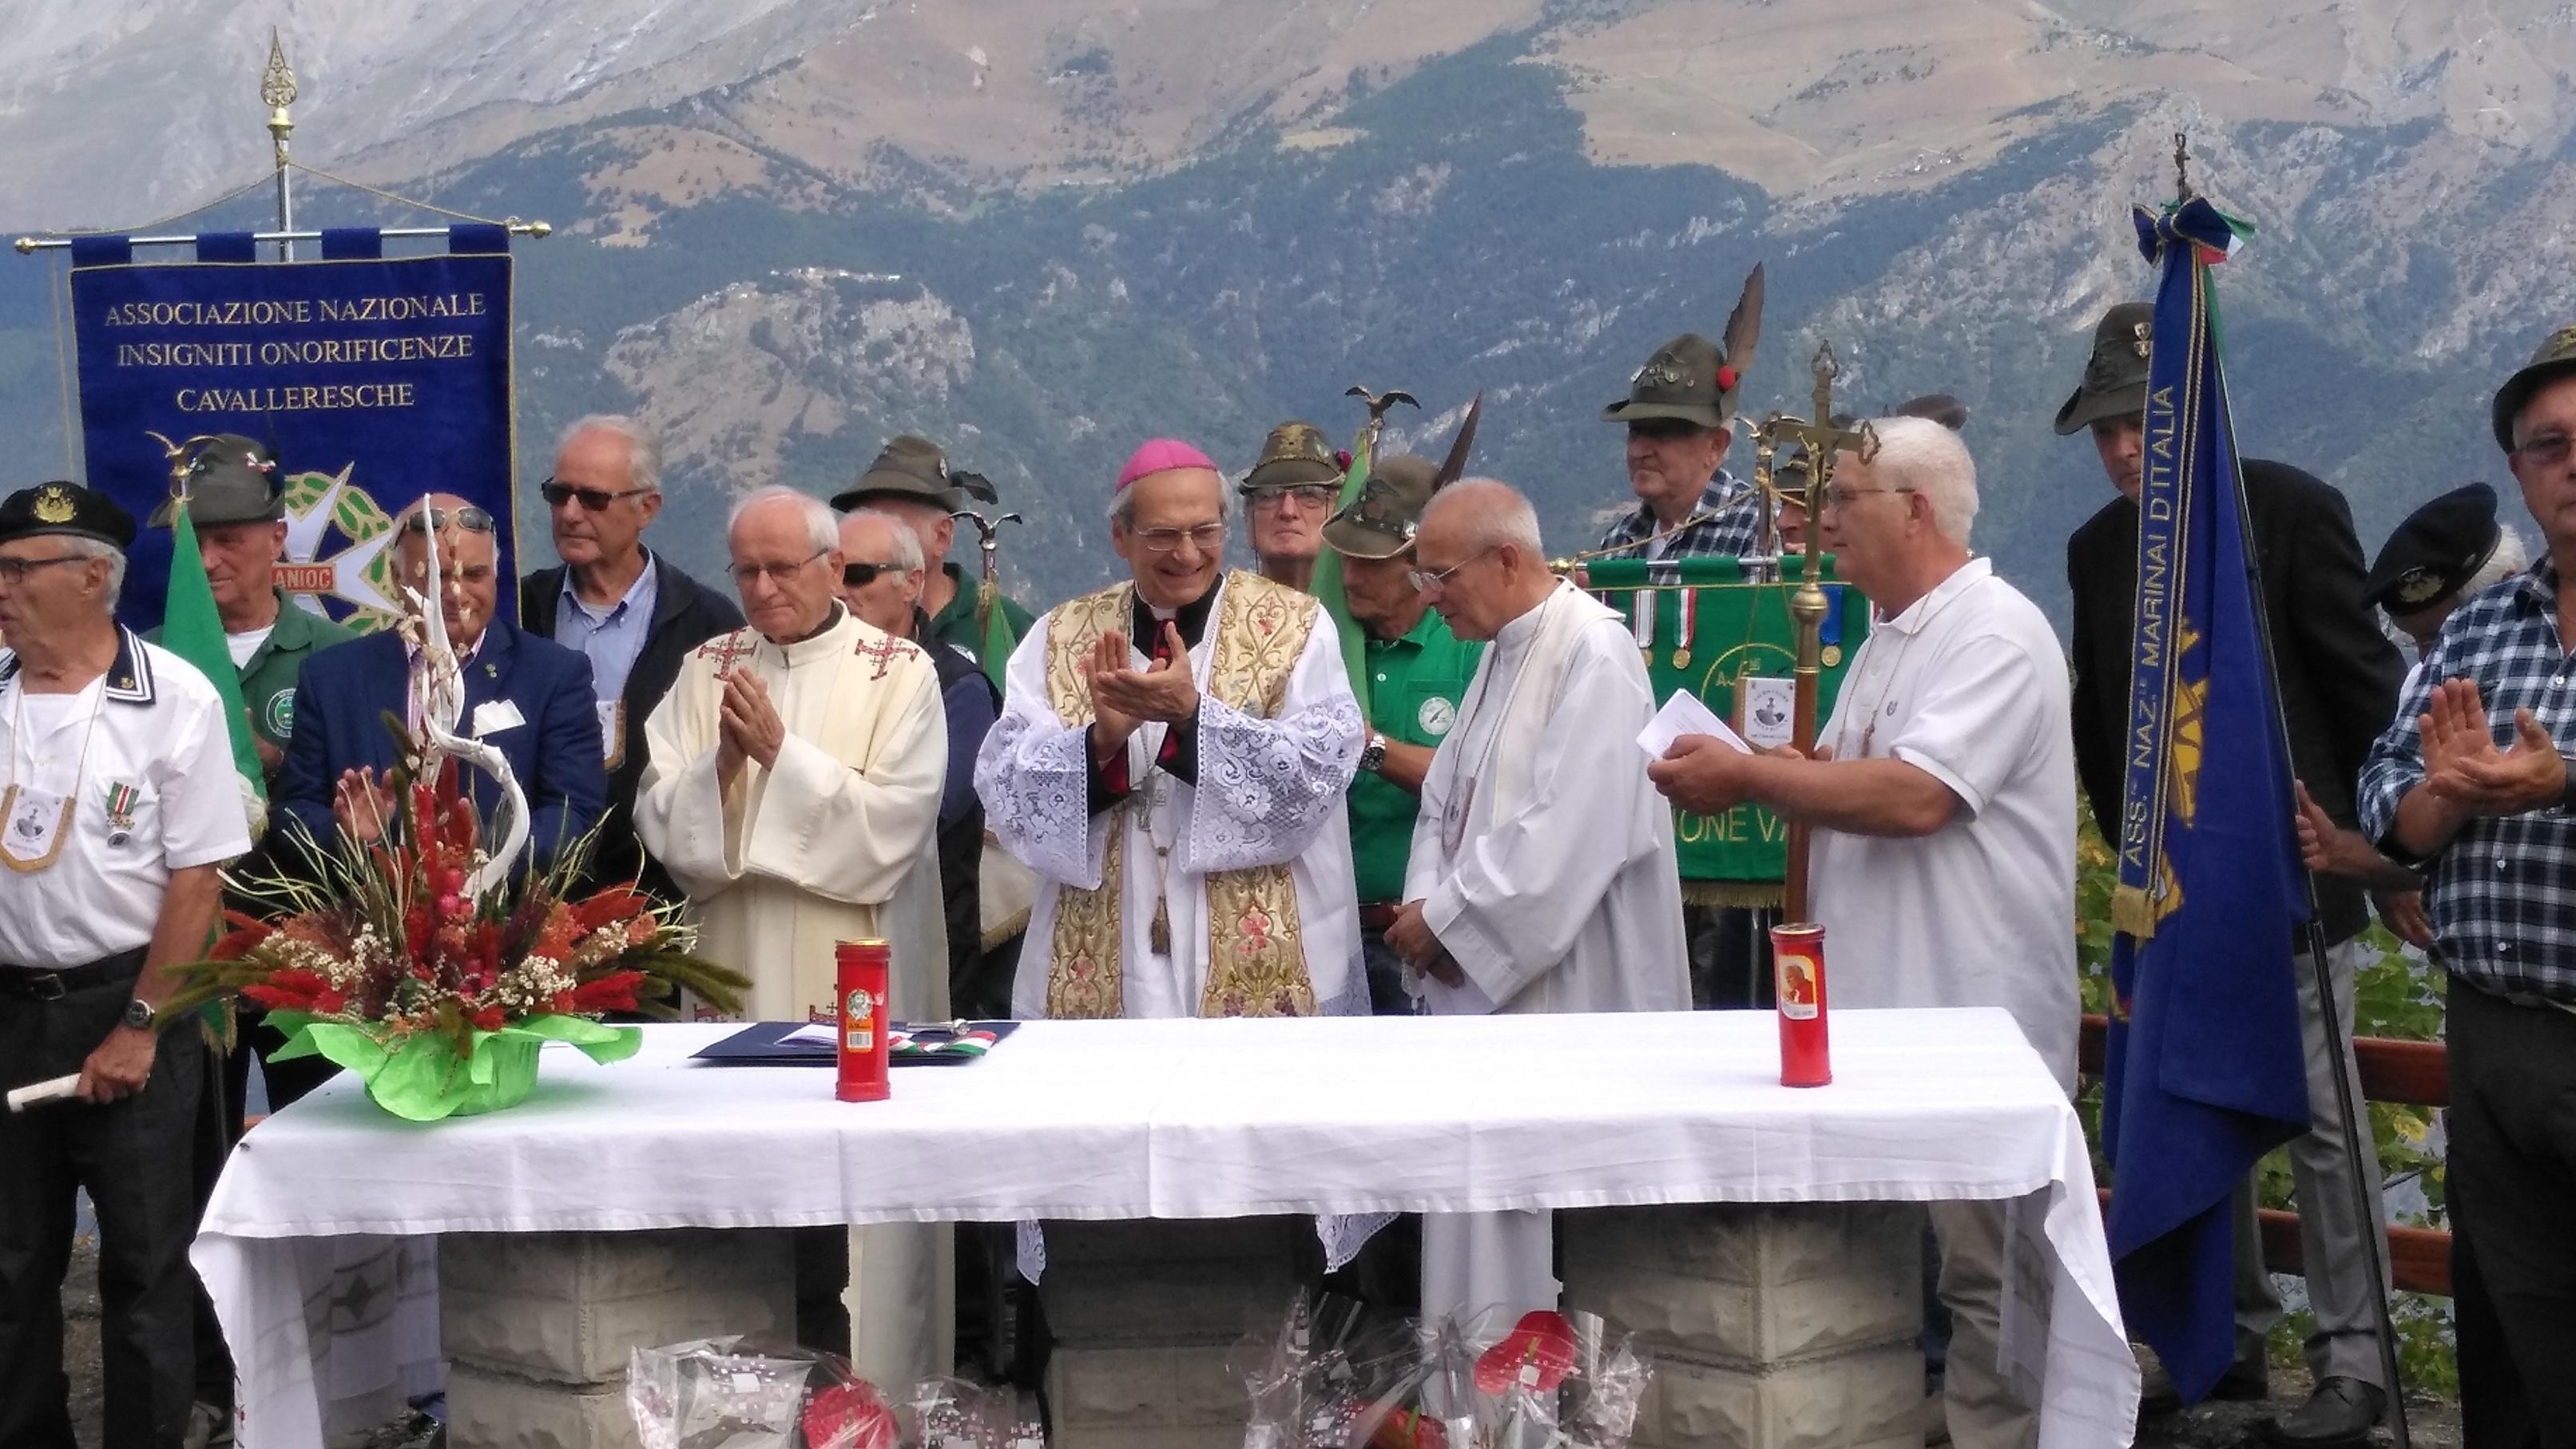 http://www.diocesidisusa.it/wp-content/uploads/2017/08/IMG_20170826_112808-Copy.jpg